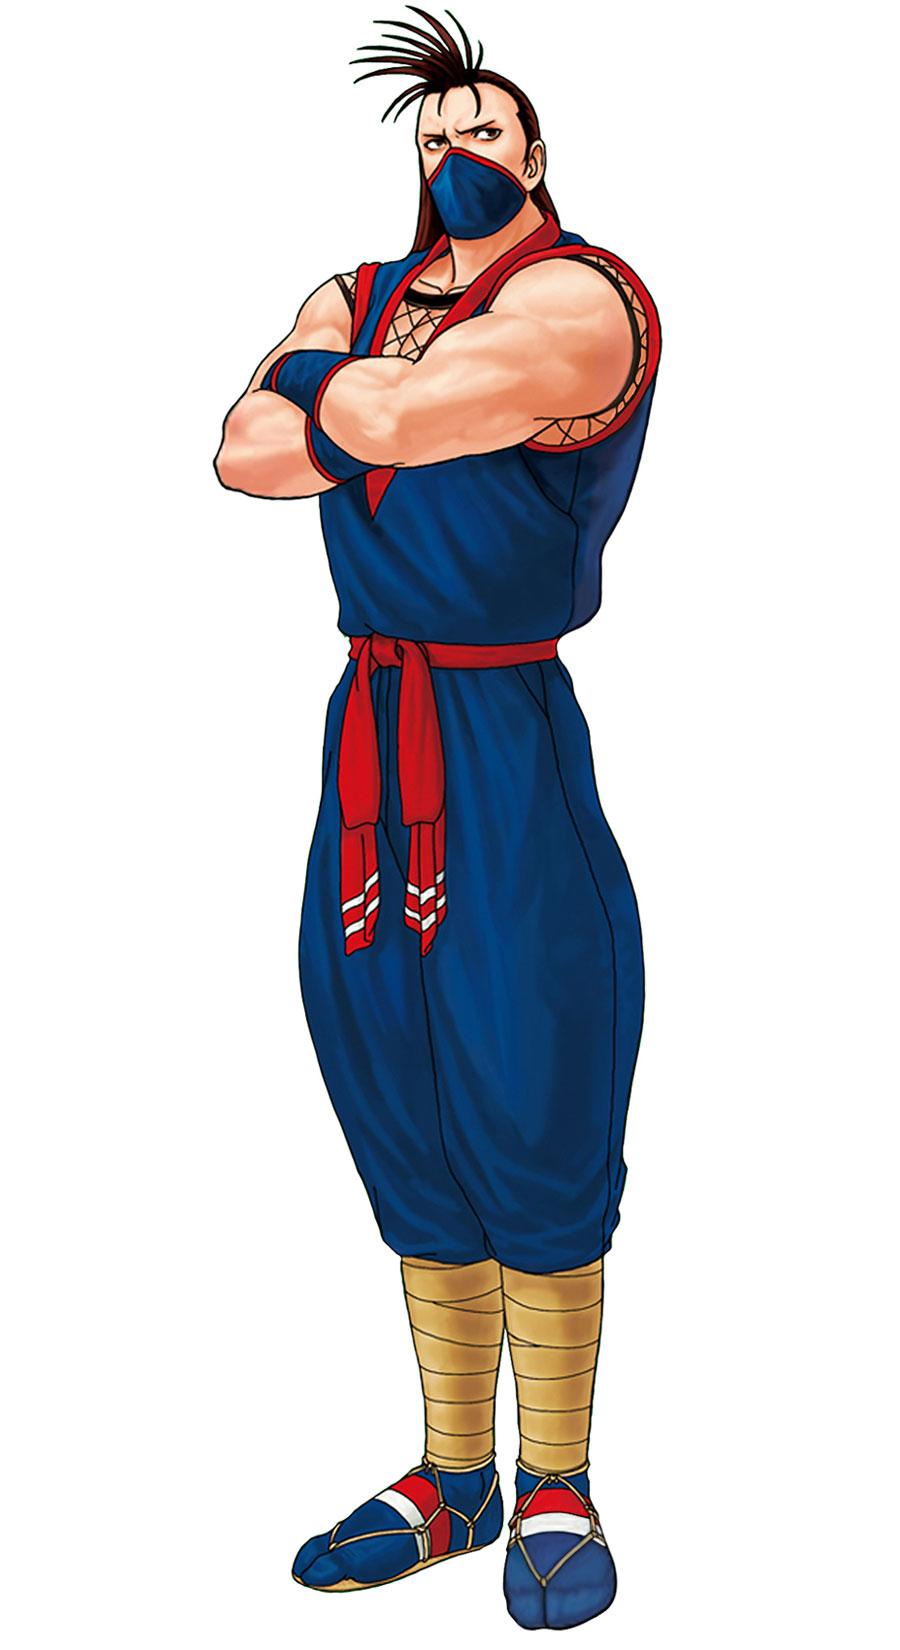 Naruto shippuden ultimate ninja storm 4 akatsuki - 5 10